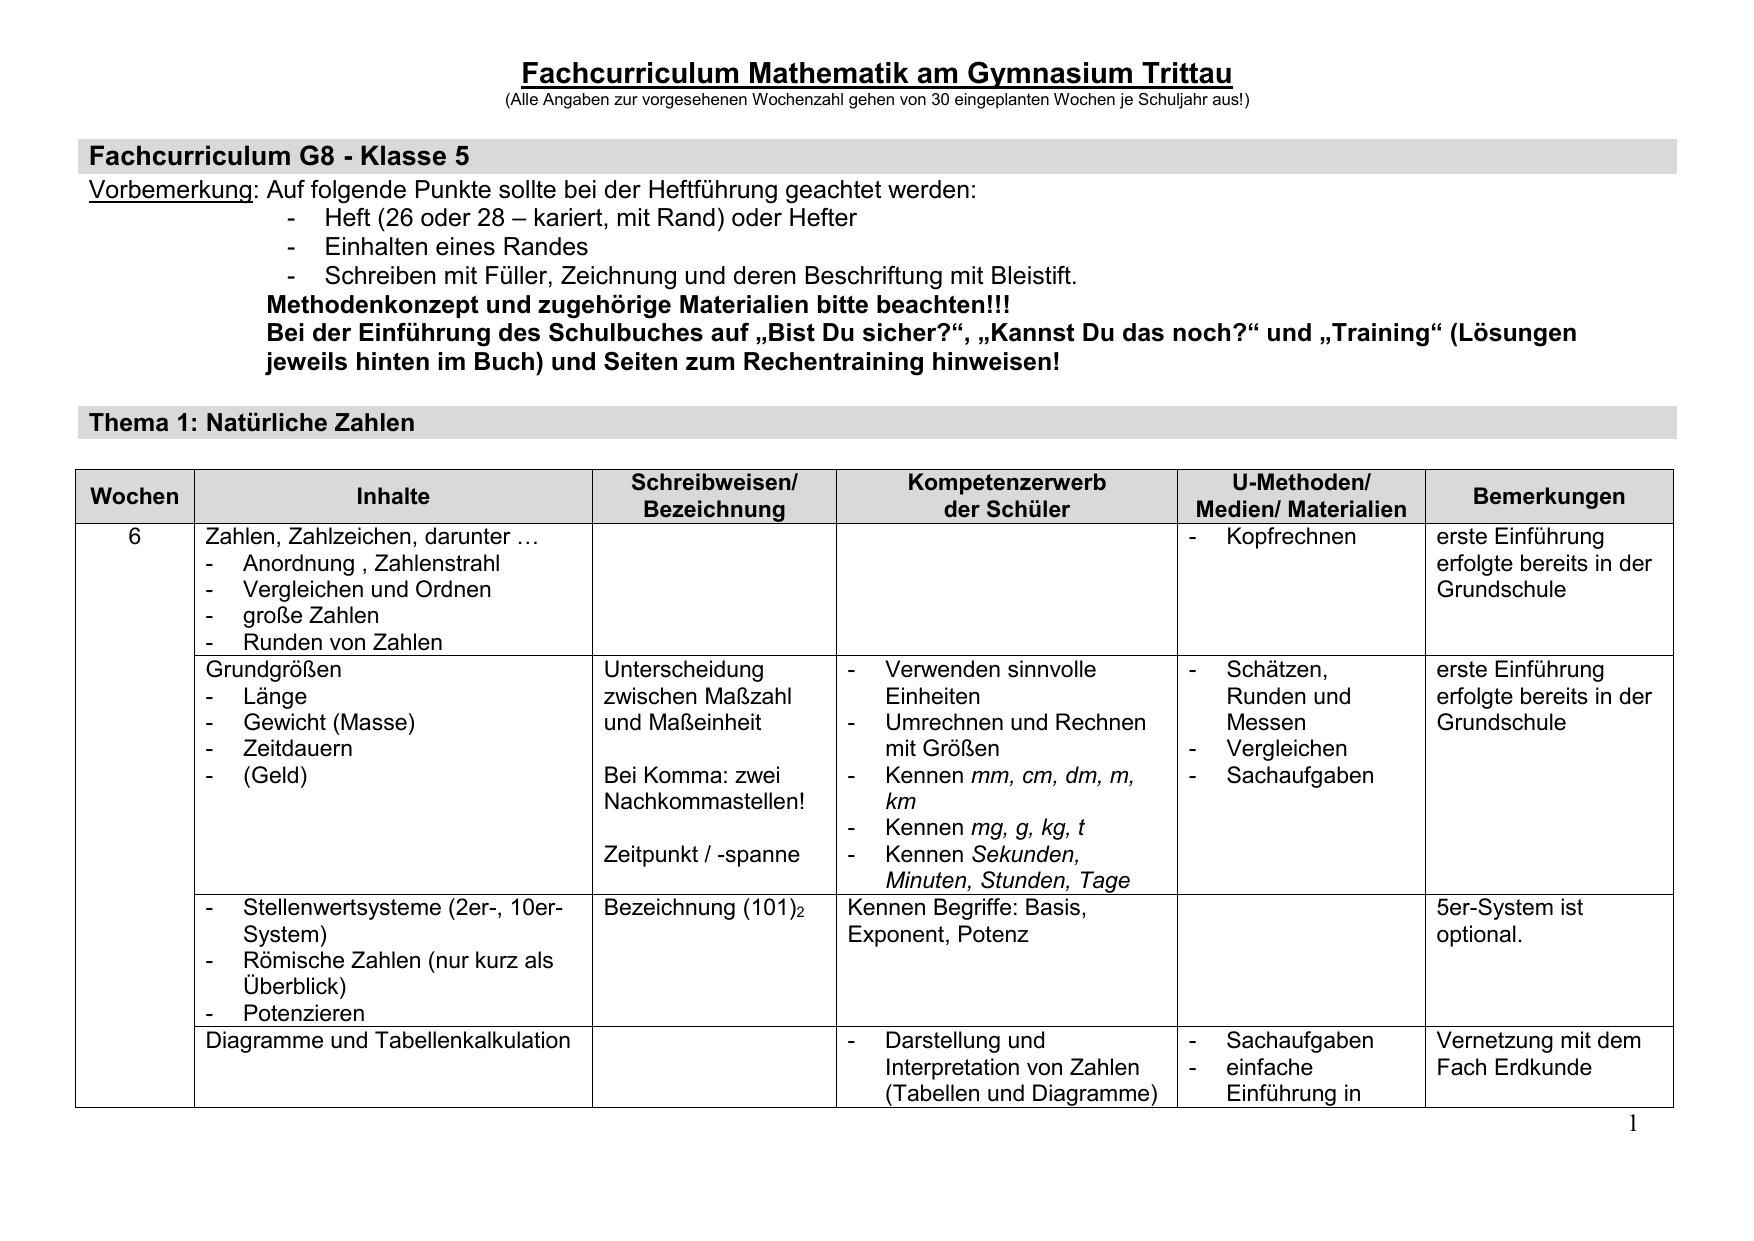 Klasse 5- G8 - Gymnasium Trittau